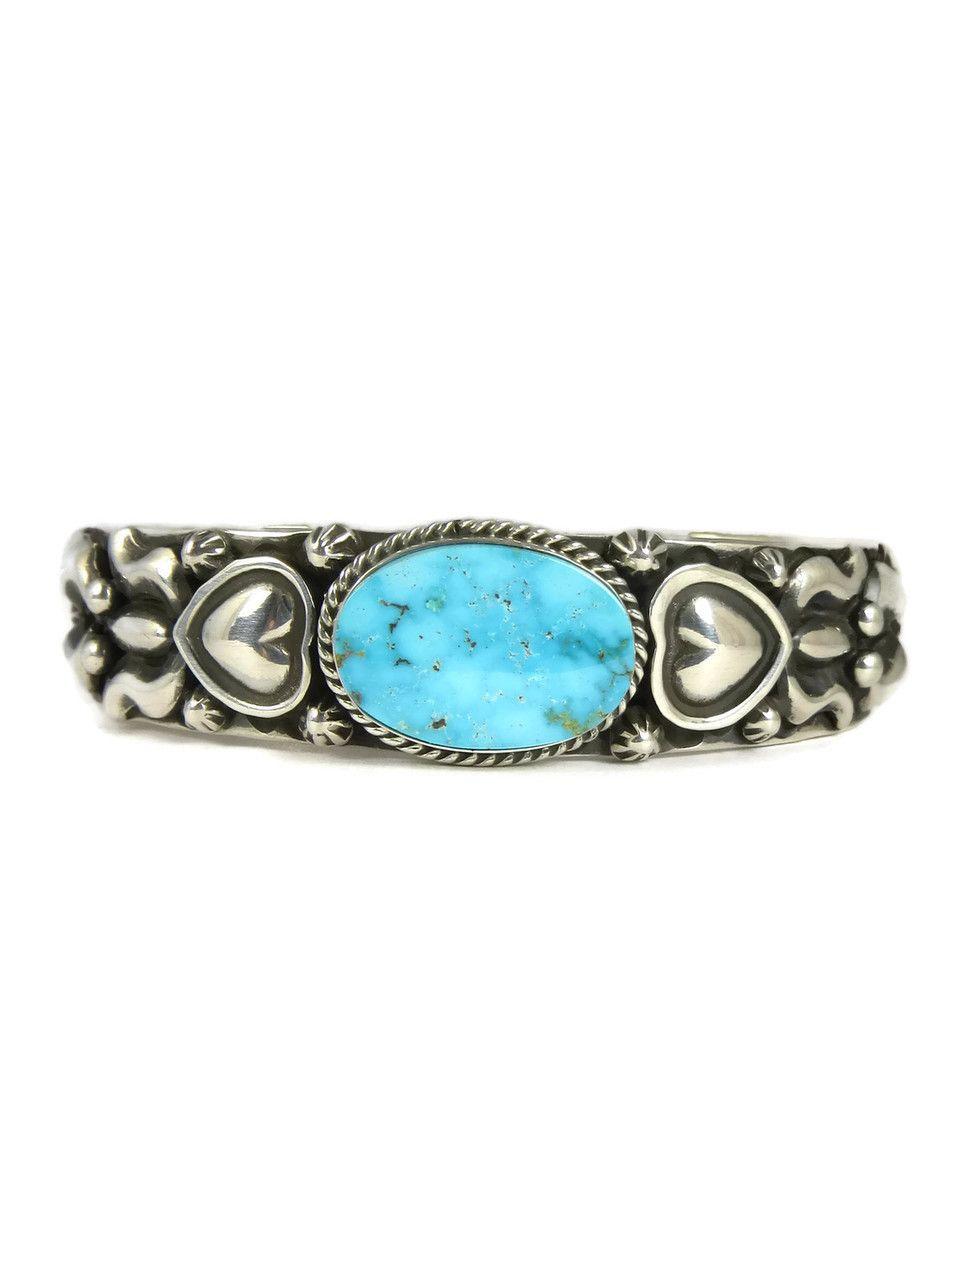 Kingman Turquoise Bracelet By Darryl Becenti Br4731